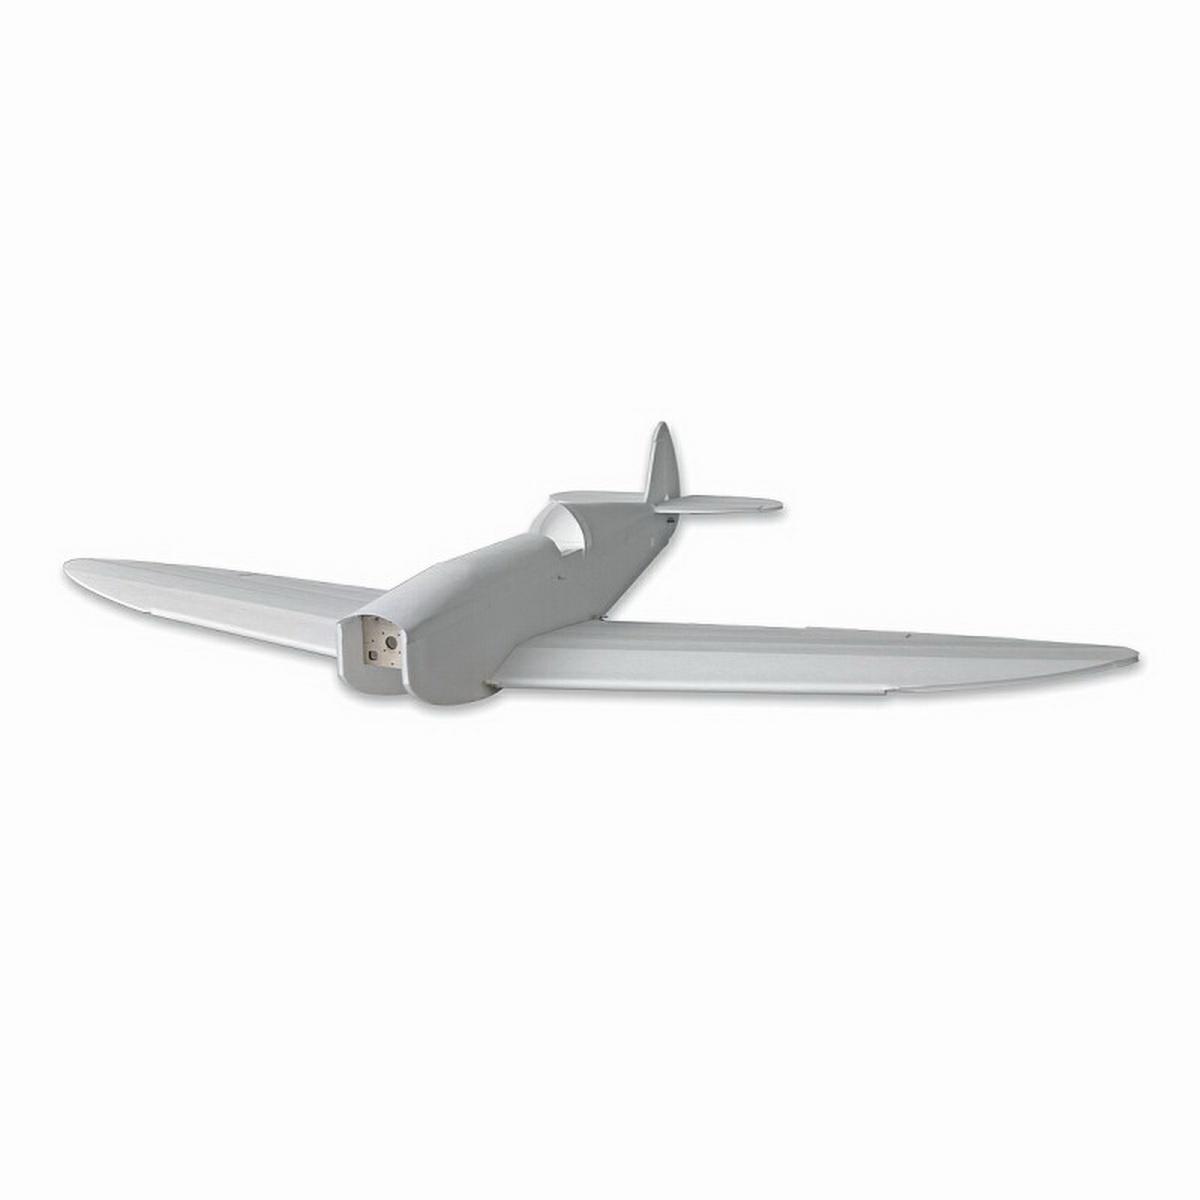 Spitfire Speed Build Kit